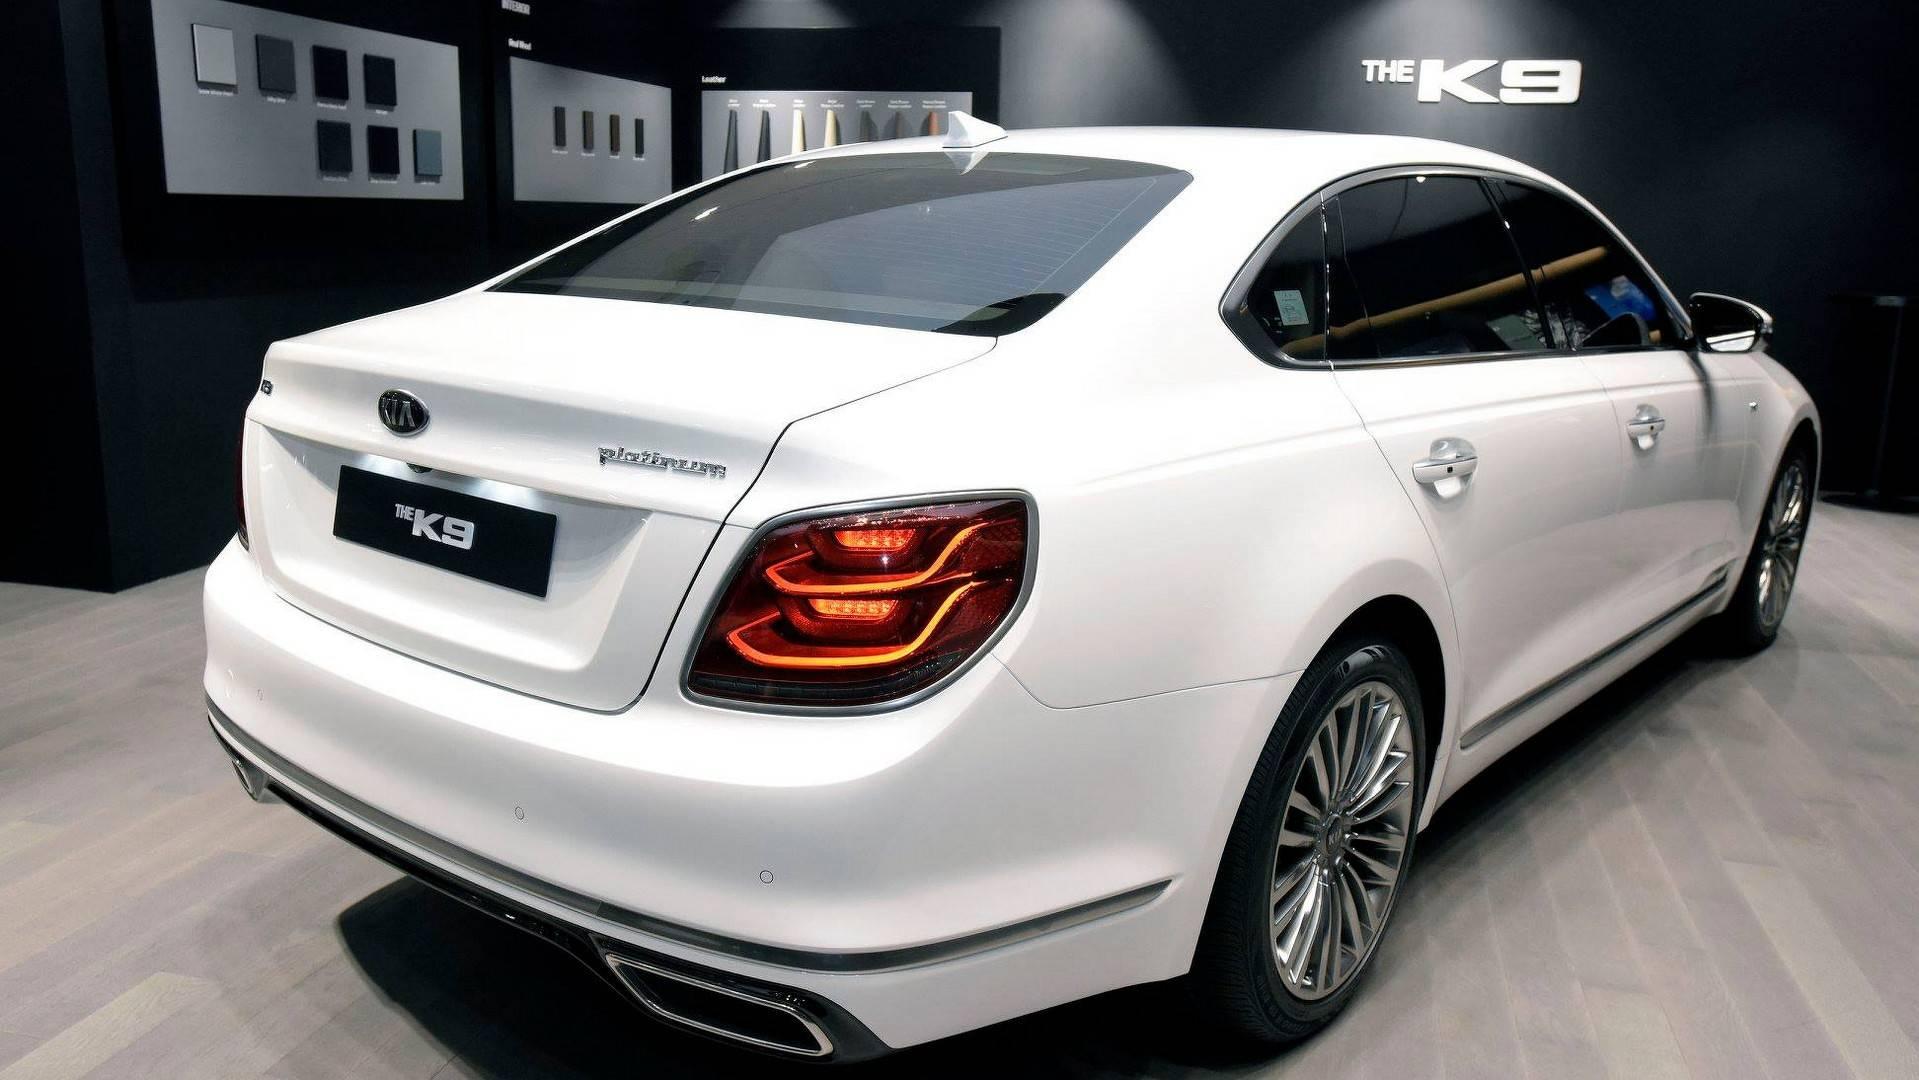 New Kia K900 Officially Revealed As K9 For South Korea